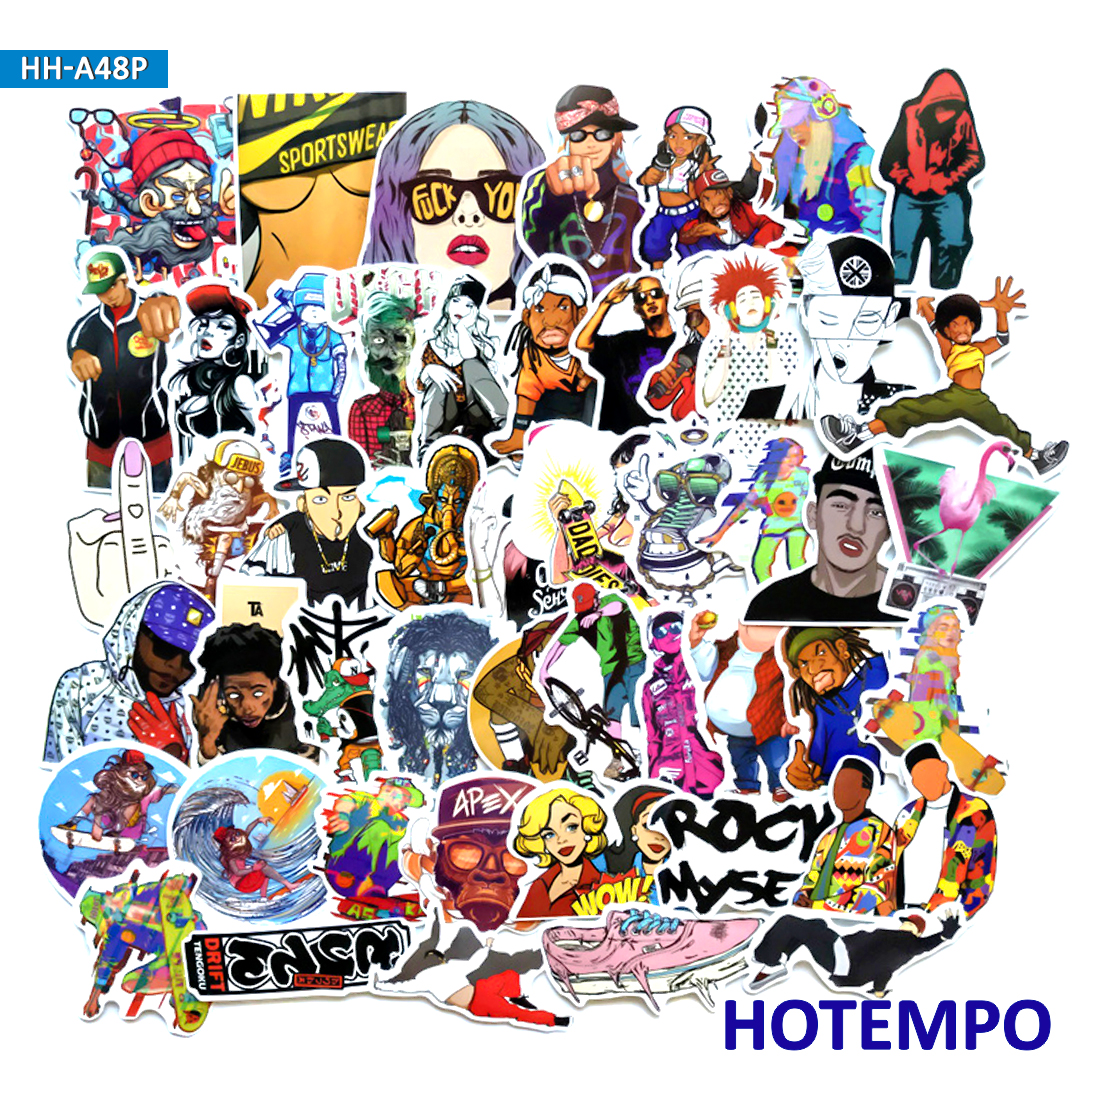 48pcs Hip Hop Rapper DJ Graffiti Style Stickers on Mobile Phone Laptop Luggage Suitcase Guitar Case Skateboard Bike BMX Stickers fonksiyonlu rende